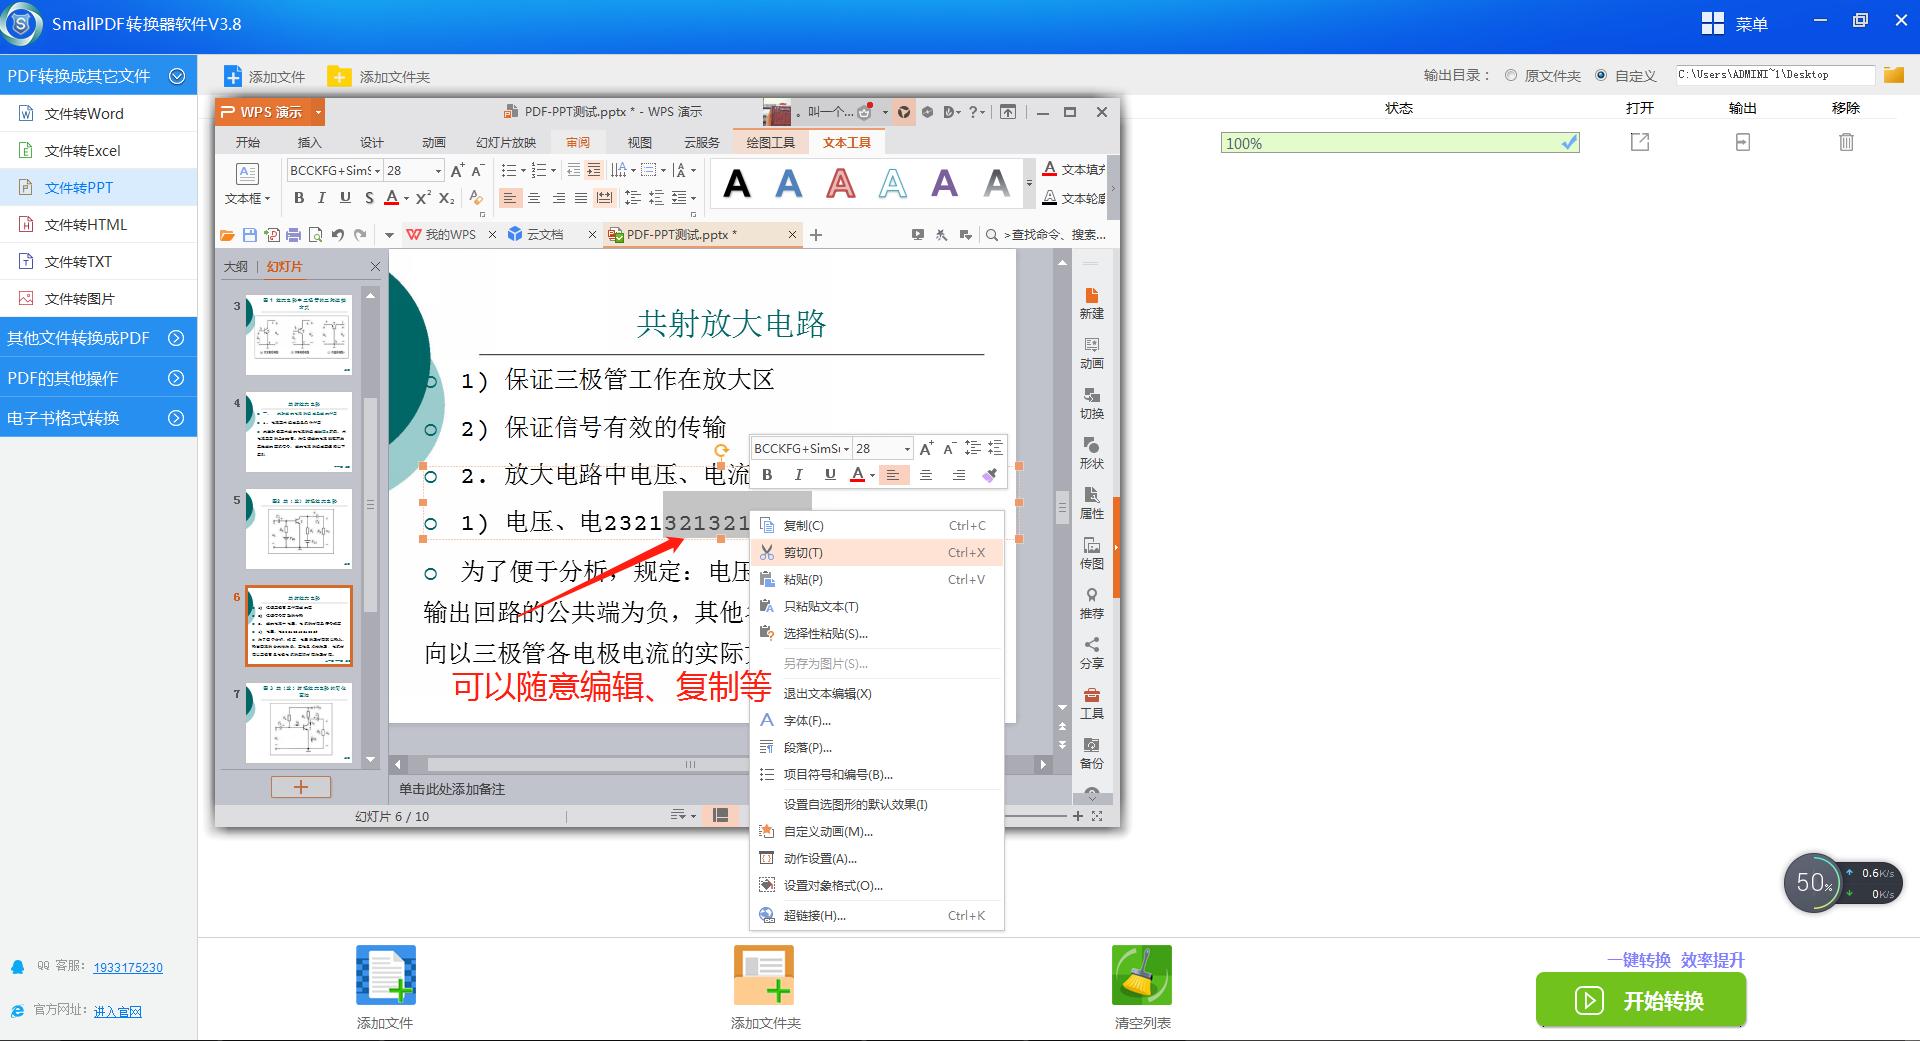 SmallPDF转换器软件V3.8的PDF转换成PPT操作流程-6